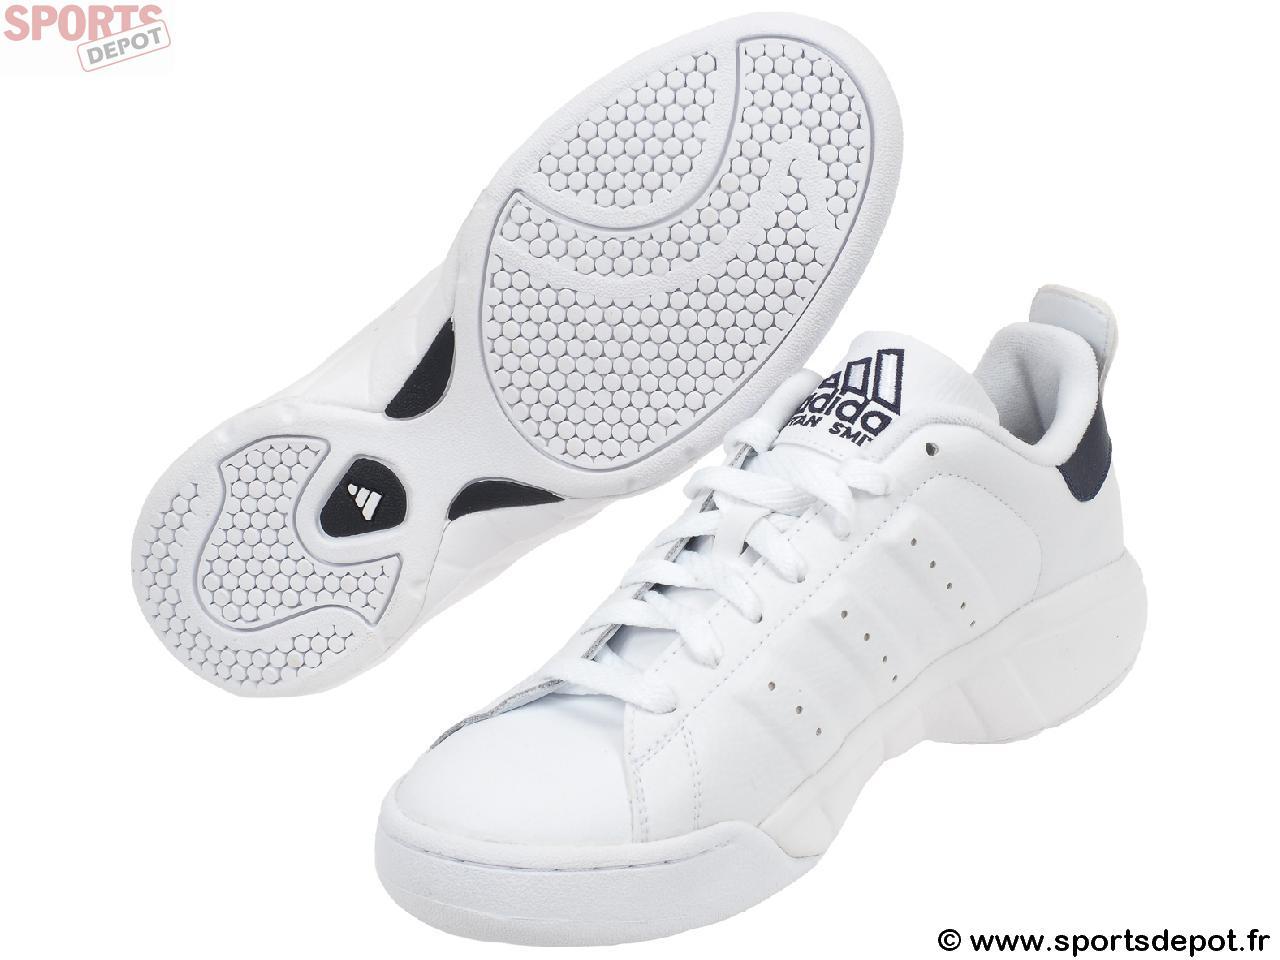 Gt Stan Adidas Chaussures Smith Tennis Mode Ville Acheter Homme wAZwx1Yq